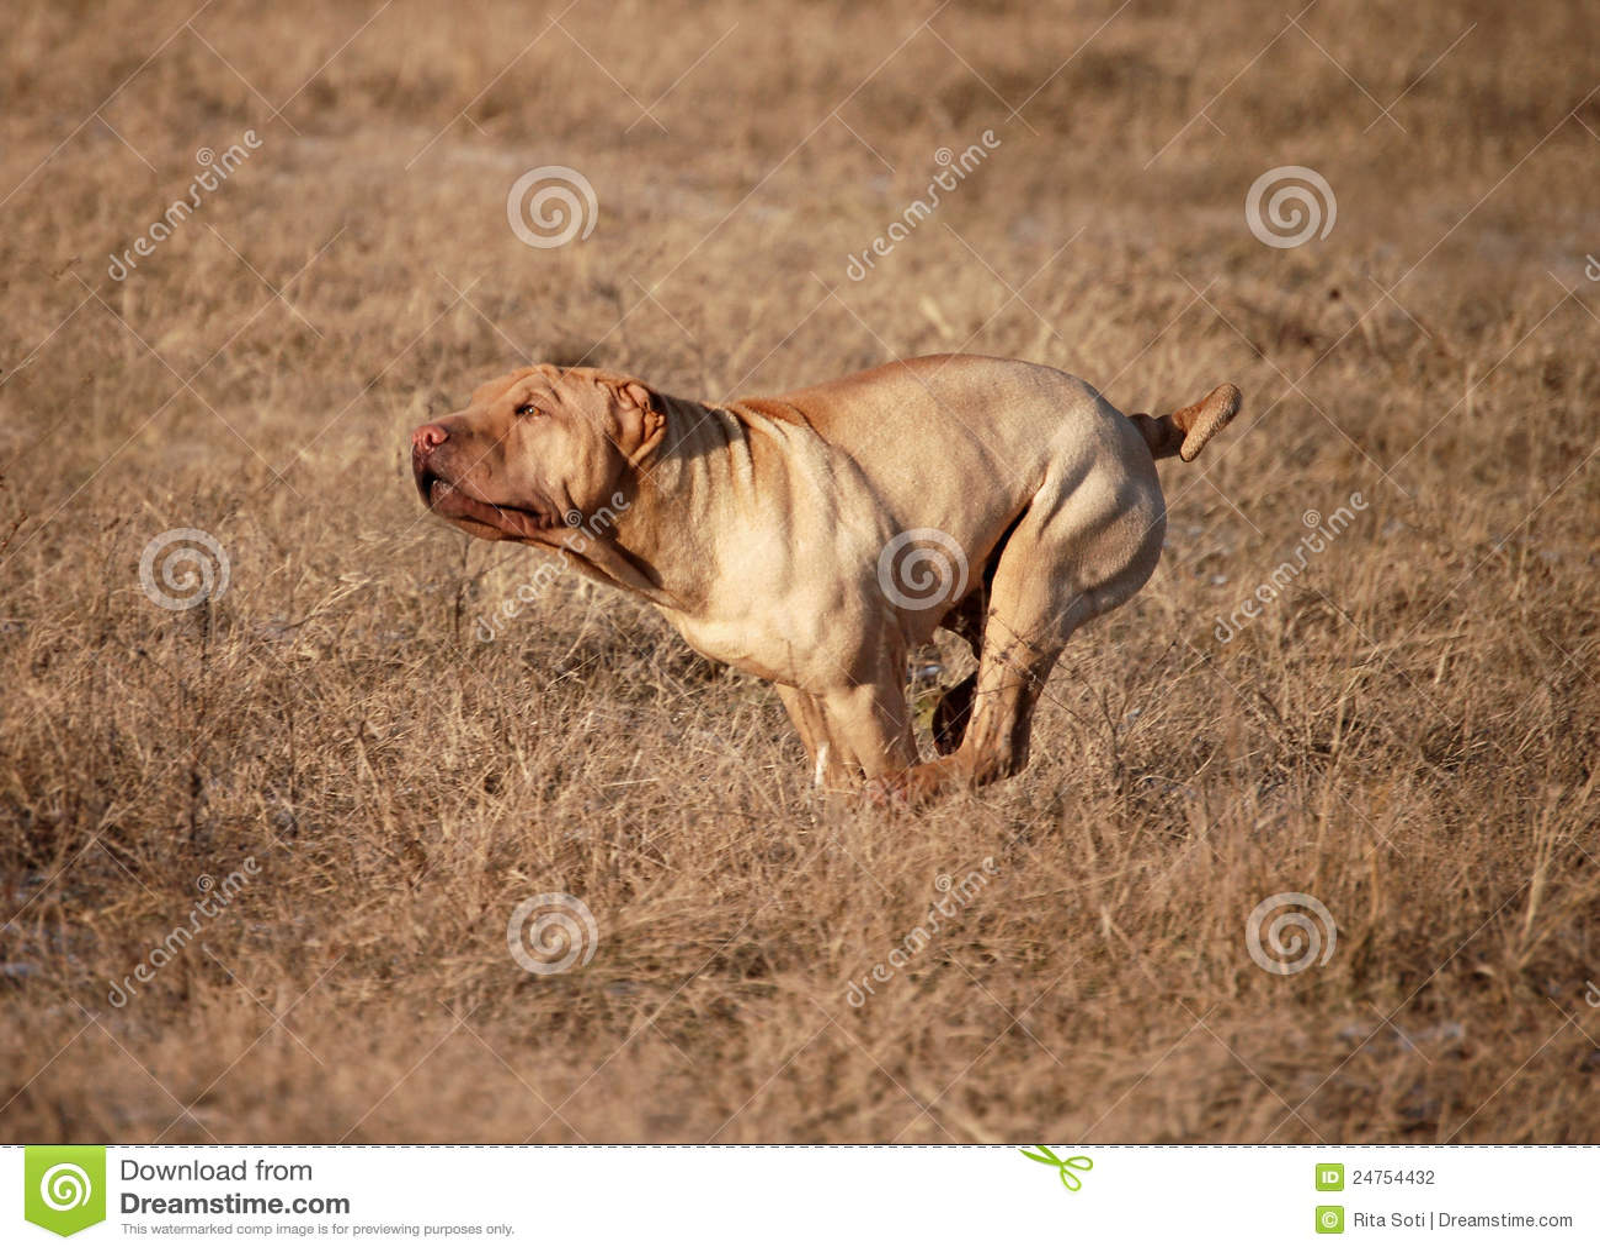 Sprinter Dog Breed